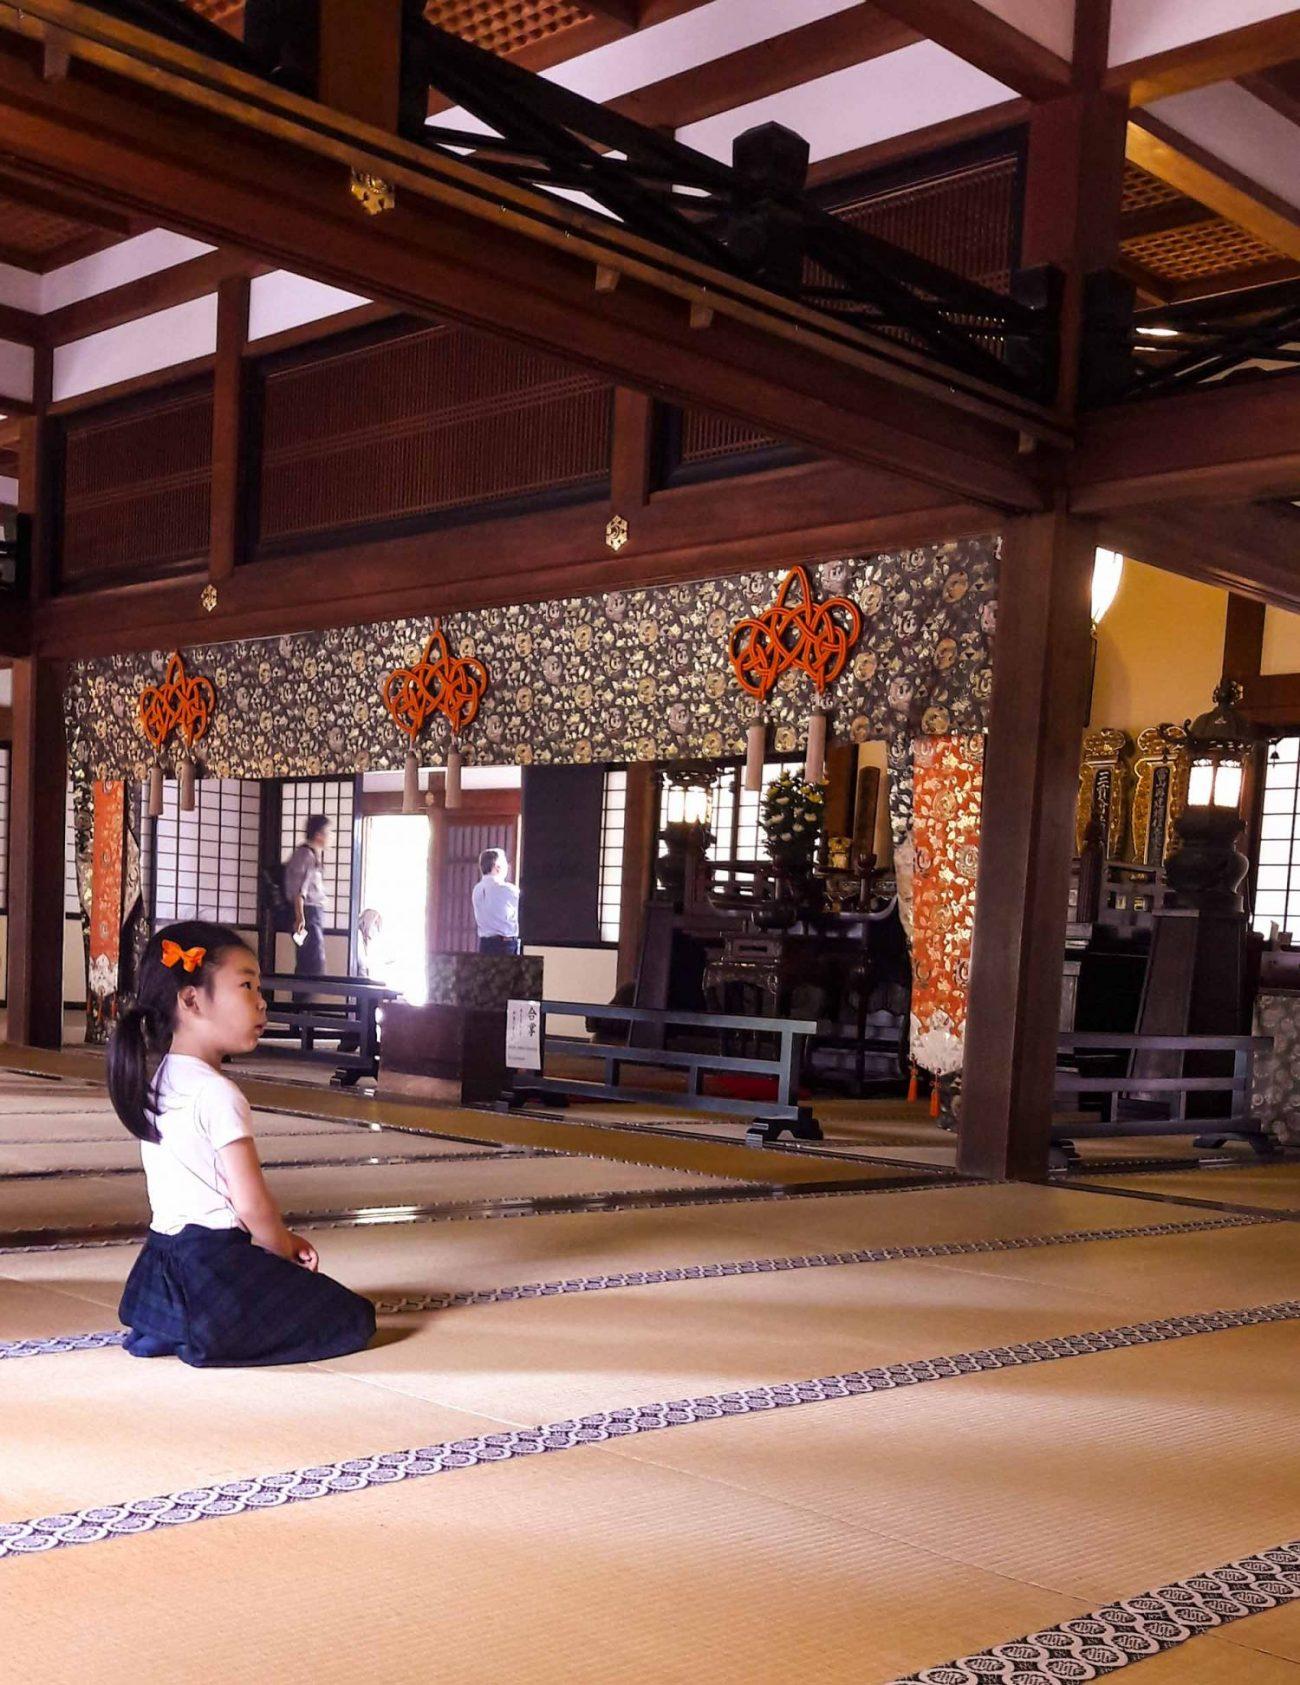 Kamakura bambina tempio buddista